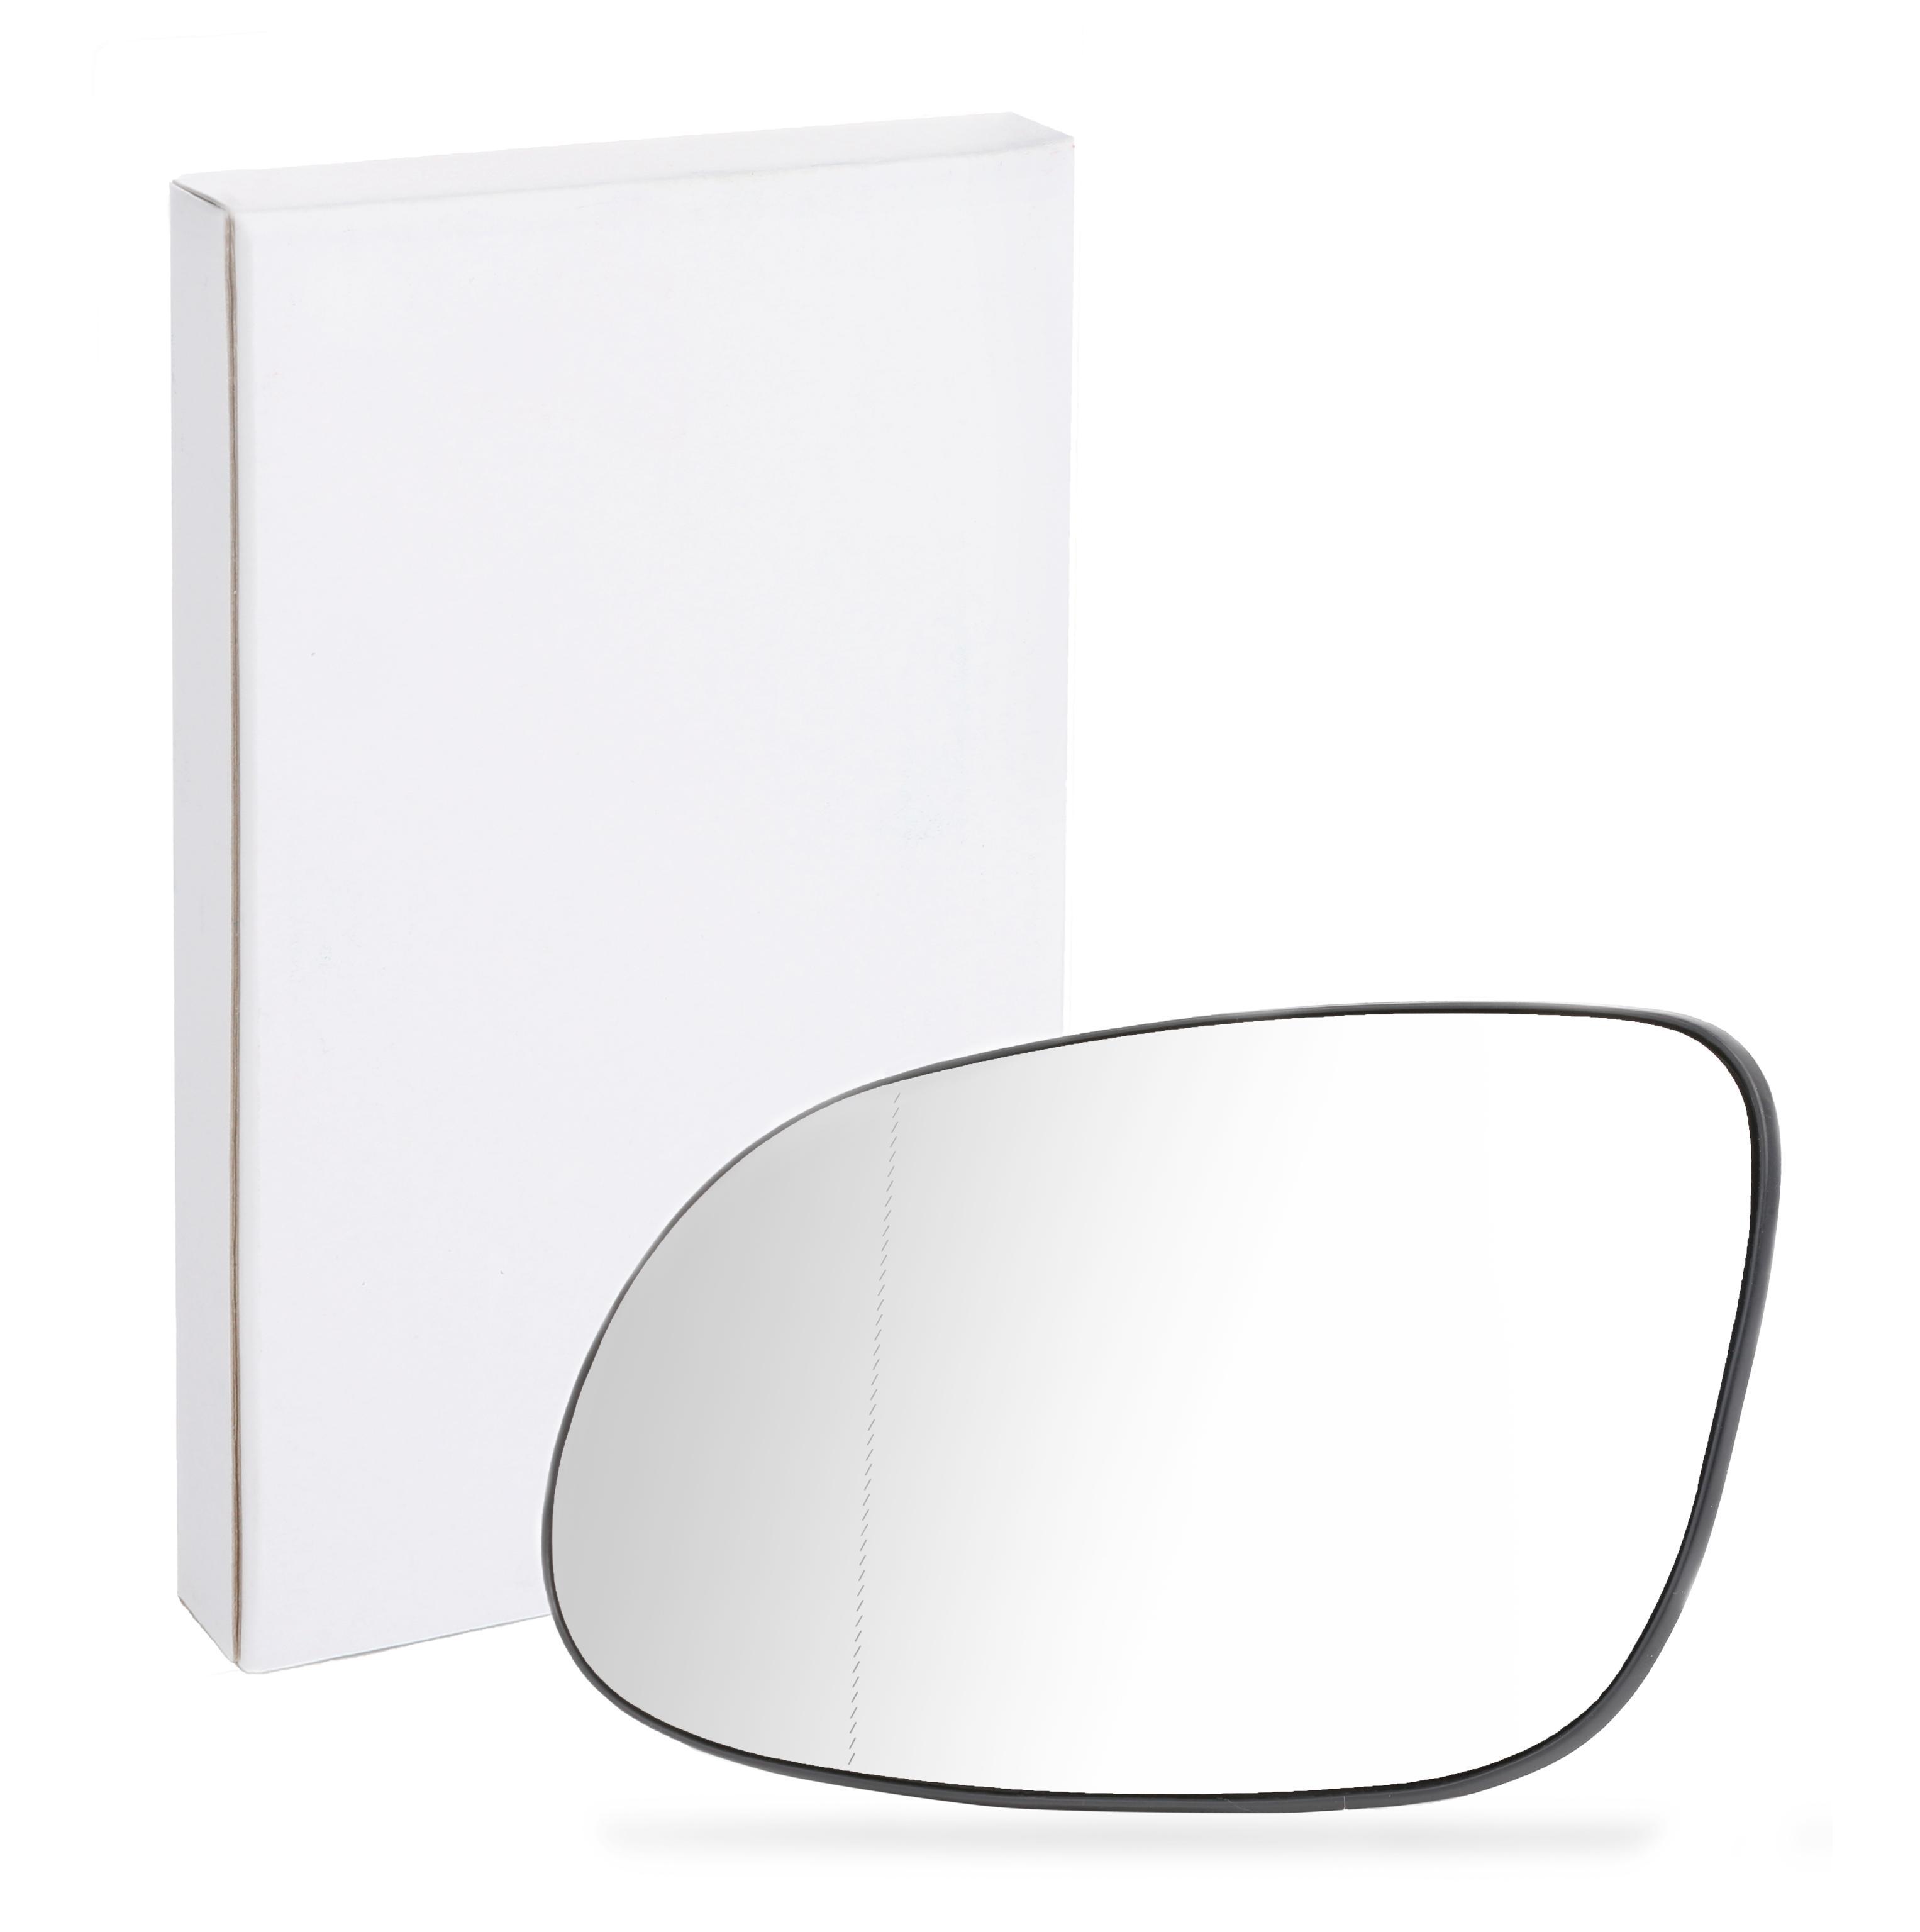 Original MERCEDES-BENZ Rückspiegelglas 50 51 37-80